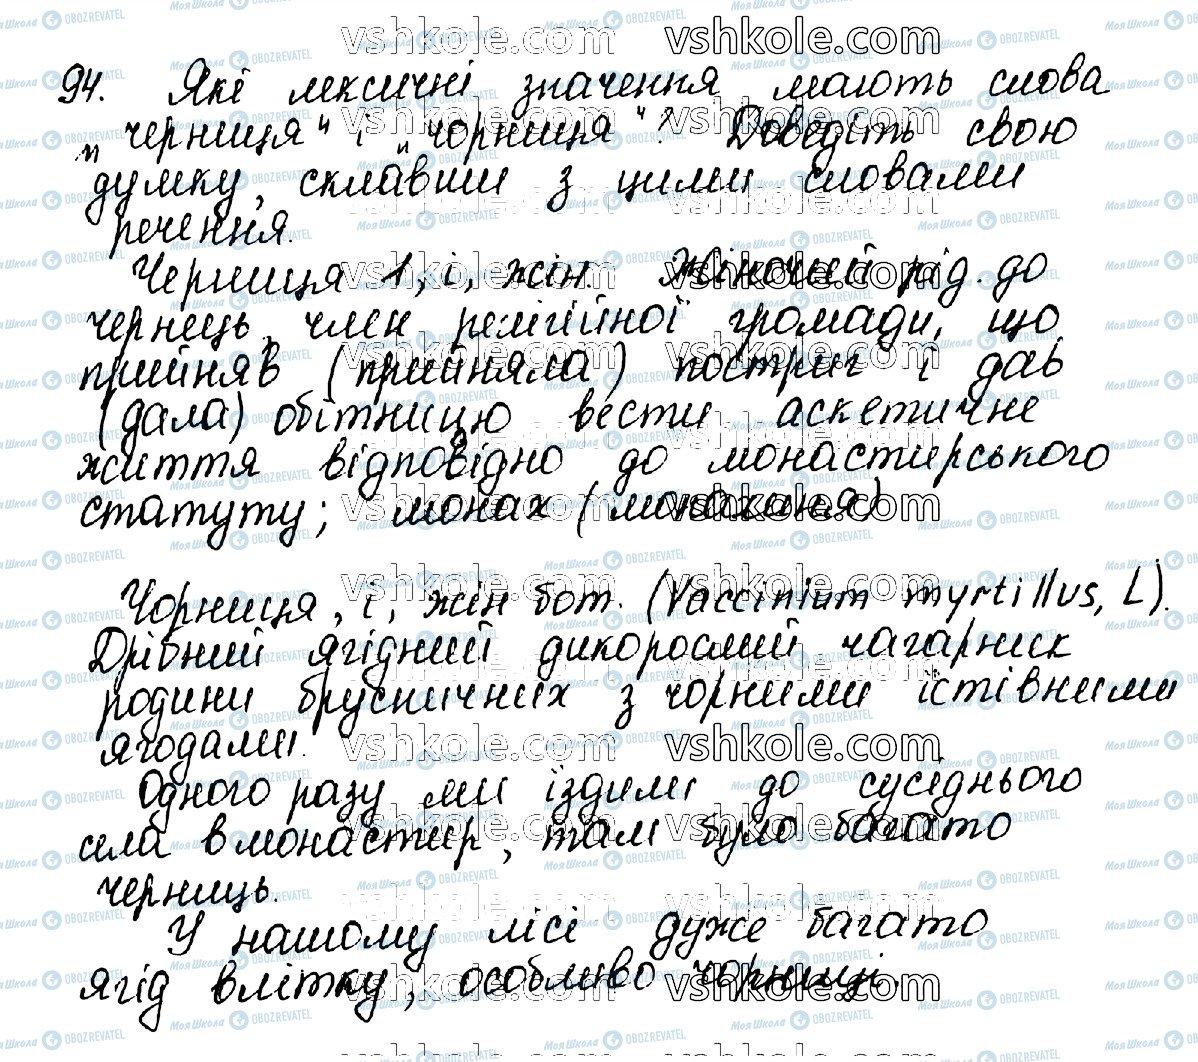 ГДЗ Укр мова 10 класс страница 94